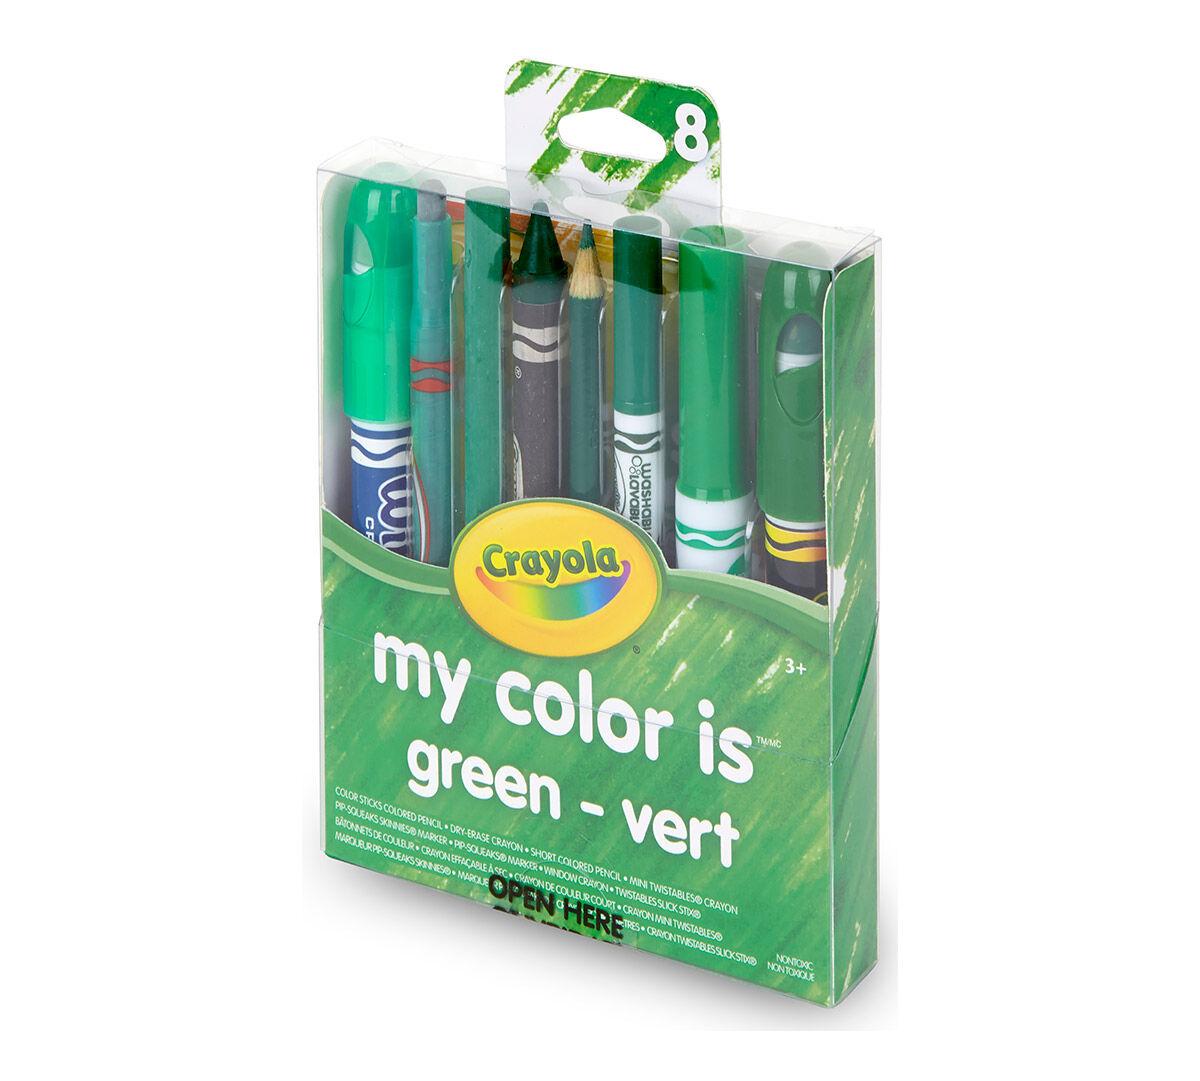 Crayola, My Color is Green